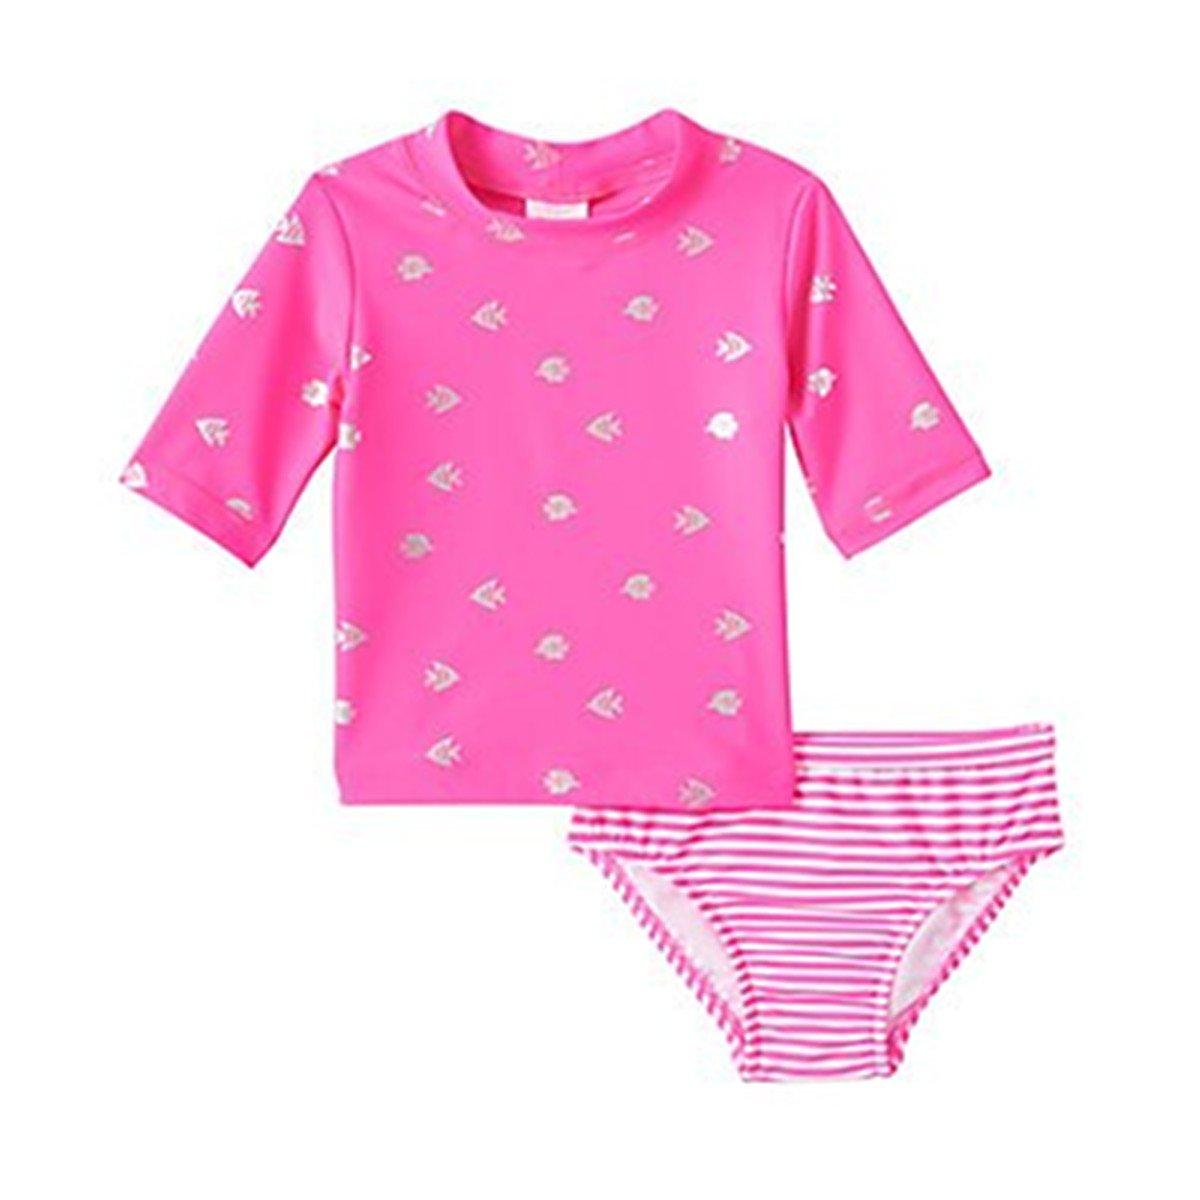 Carters Baby Girls Short Sleeve Pink Foil Fish Rash Guard Set (12M)